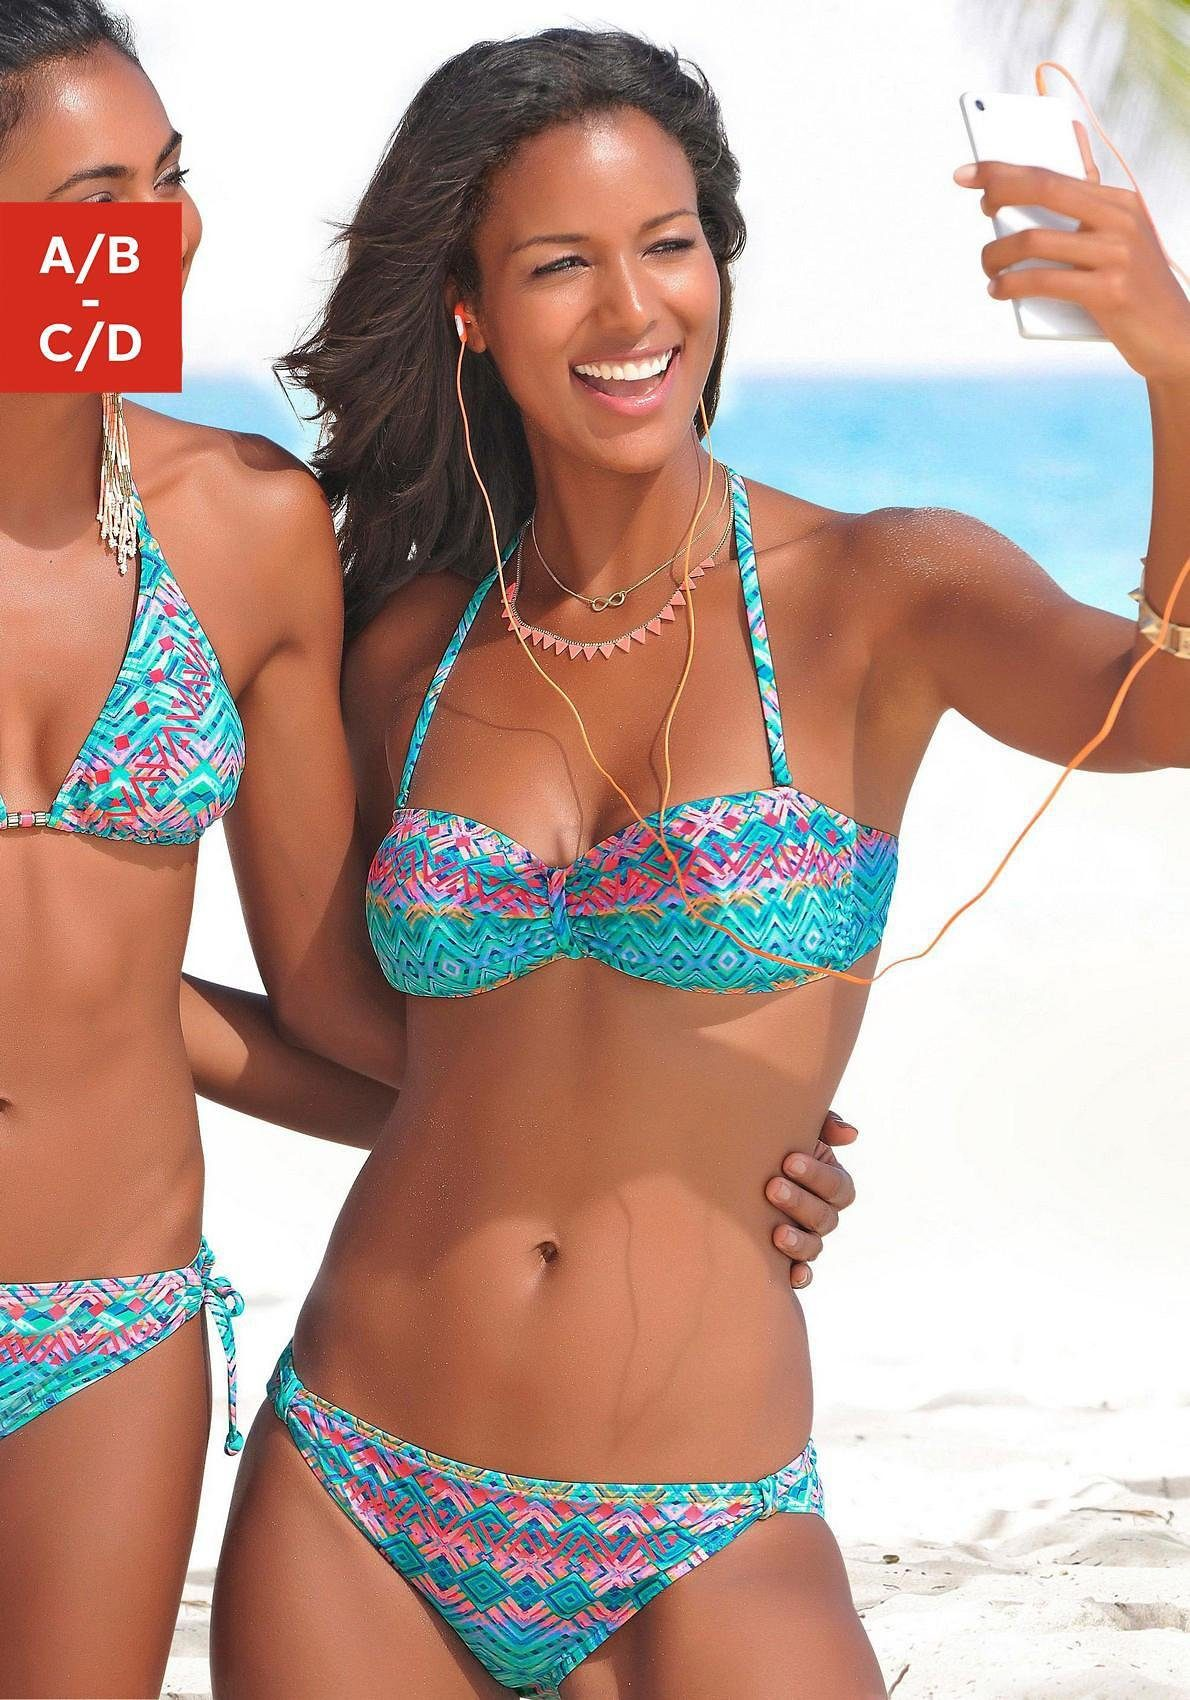 Buffalo Bandeau-Bikini mit grafischem Muster